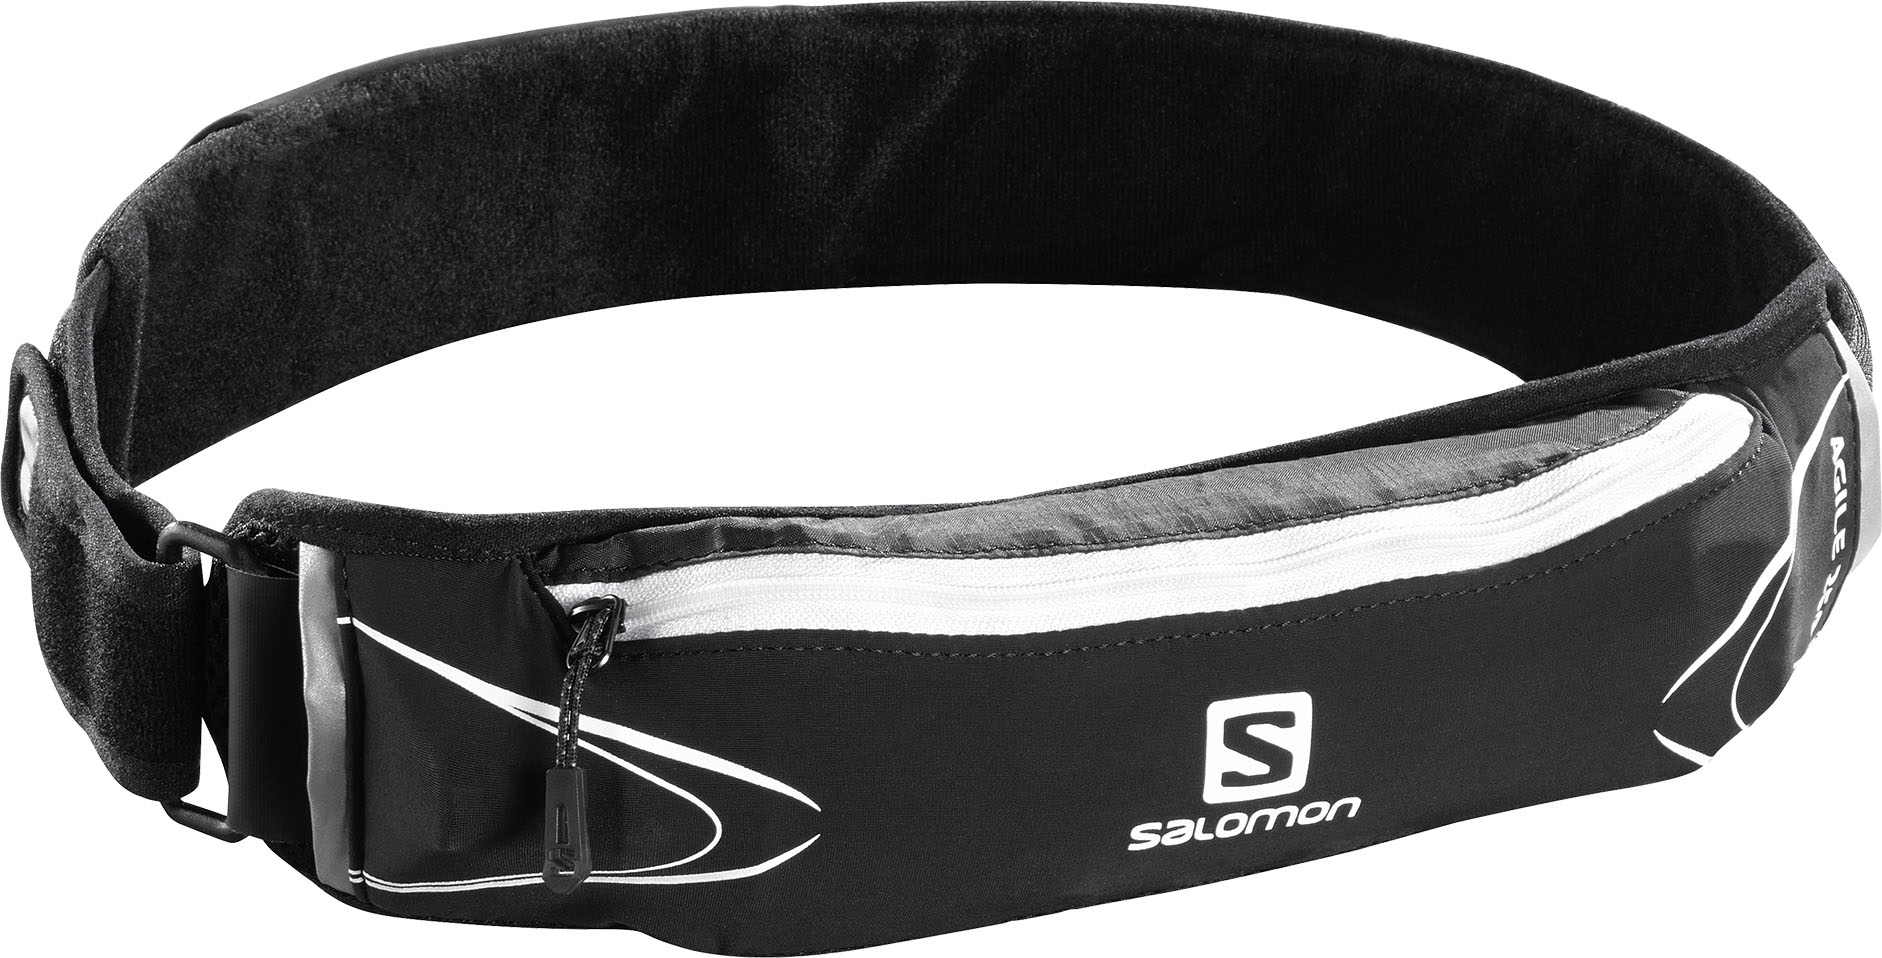 Salomon Agile 250 Belt Set Black/White 375790 černá